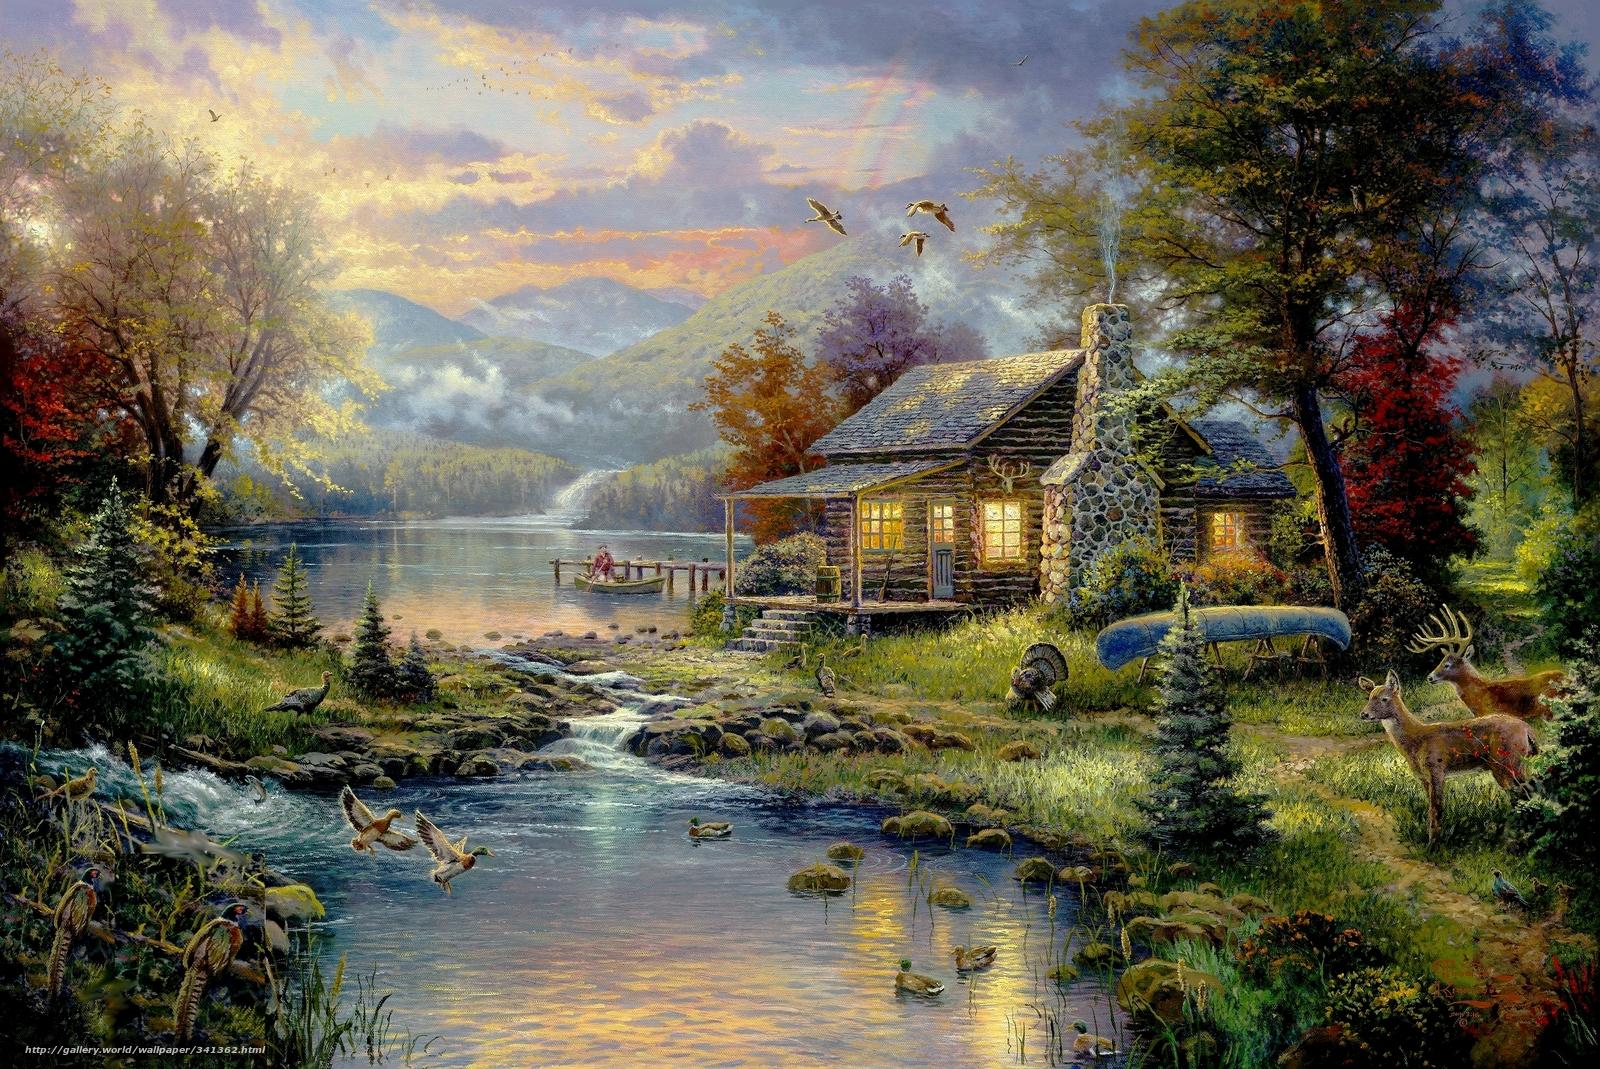 wallpaper picture Thomas Kinkade painting paradise desktop 1600x1069